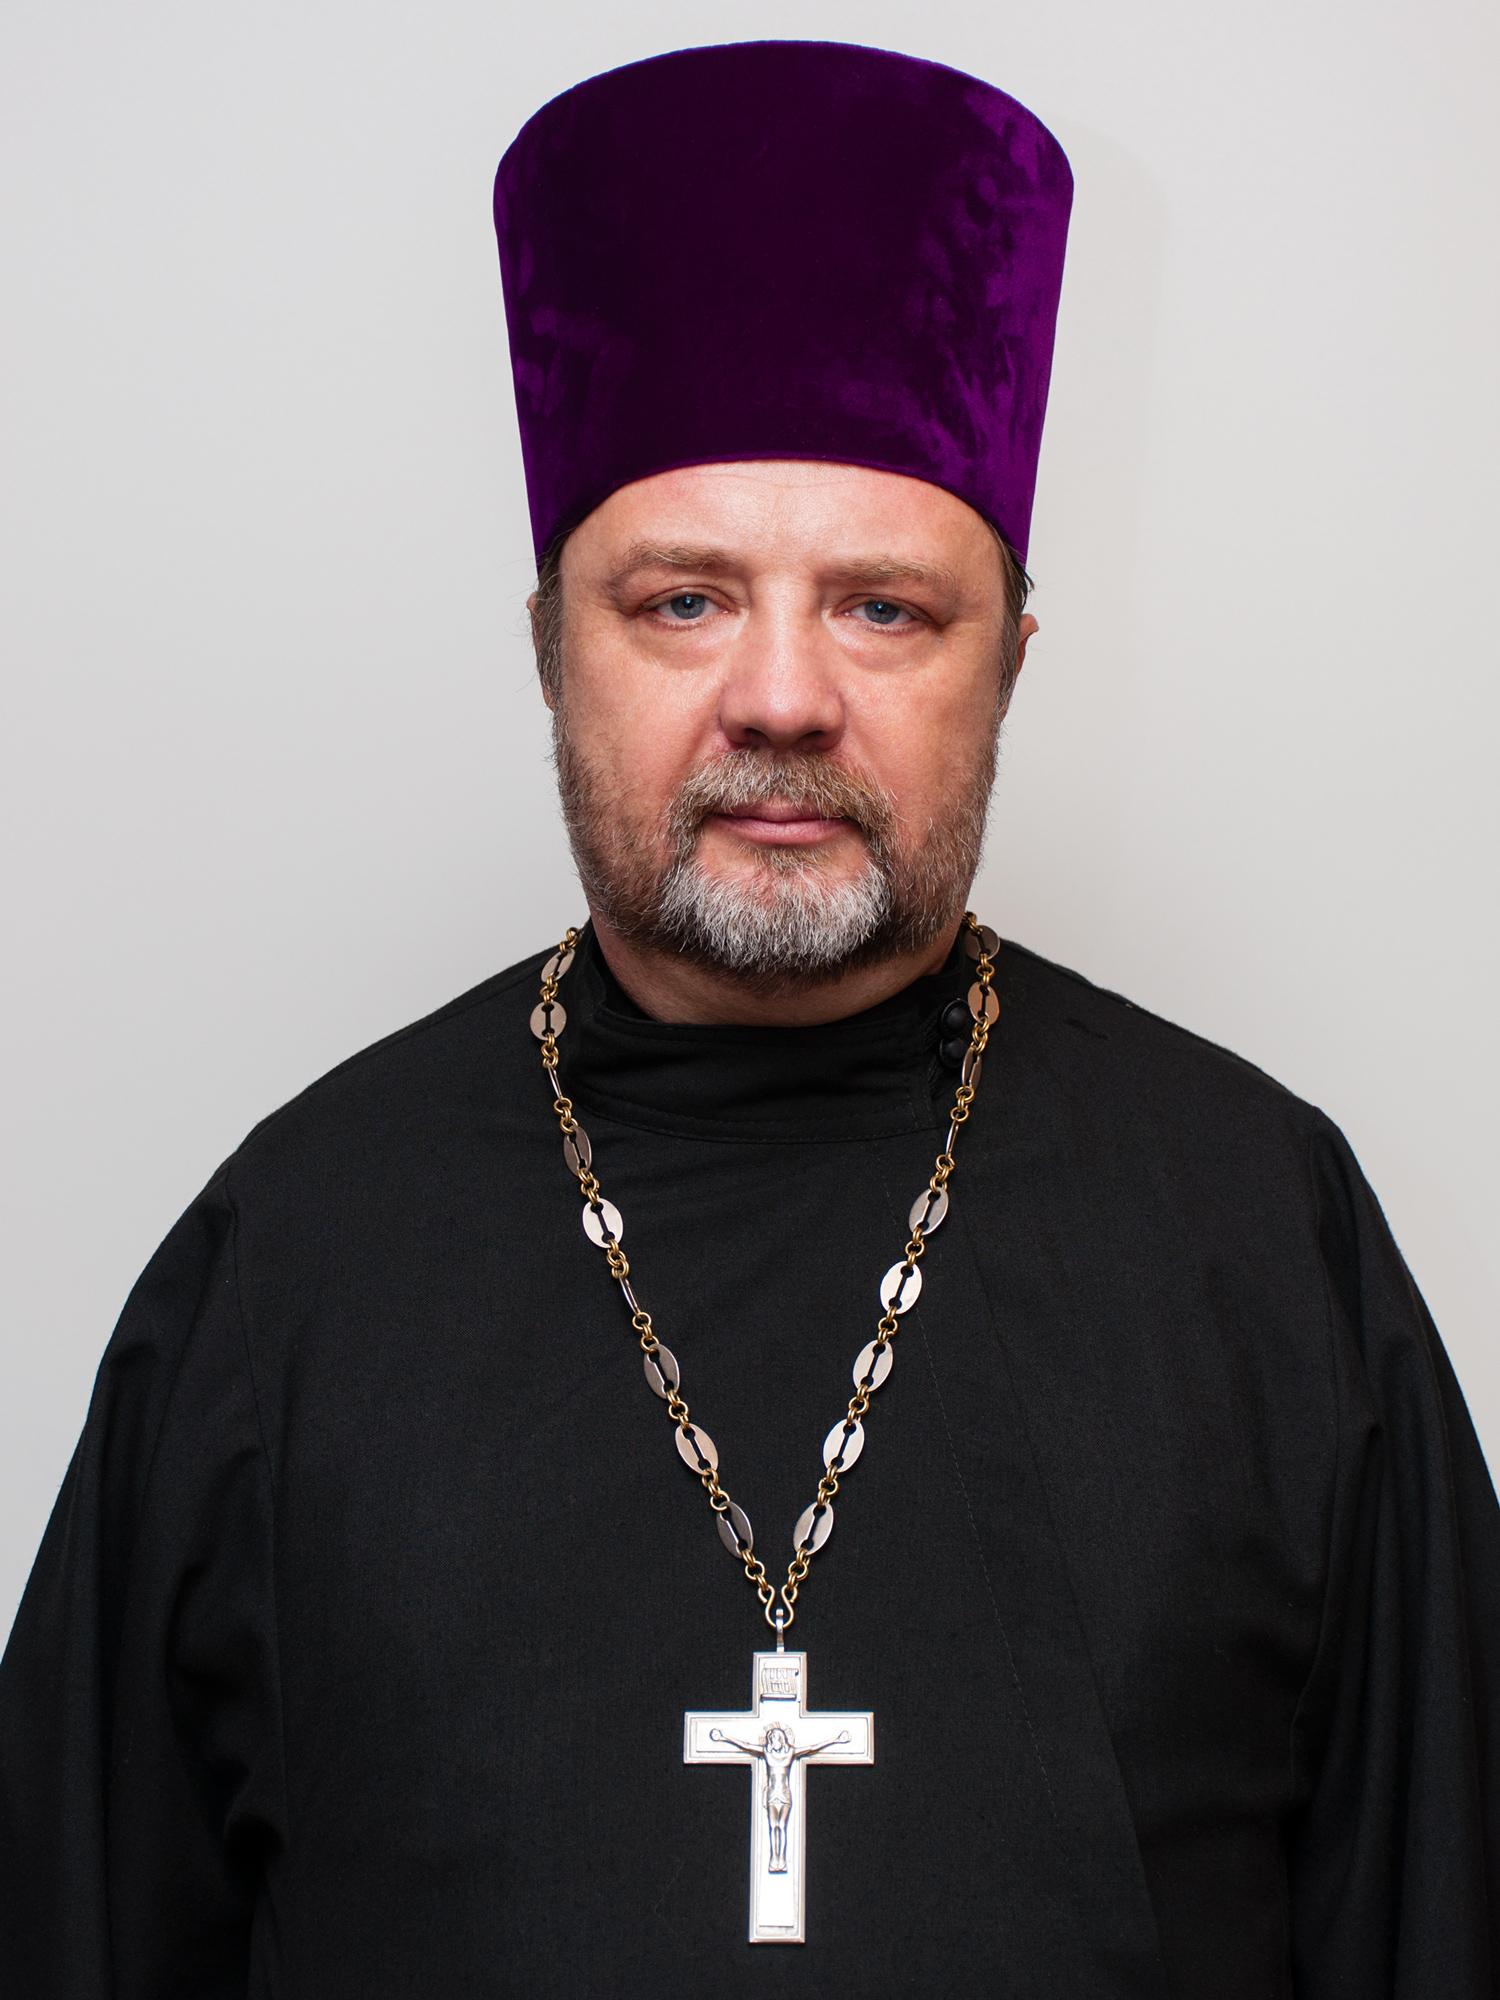 Протоиерей Александр Геннадьевич Чиков